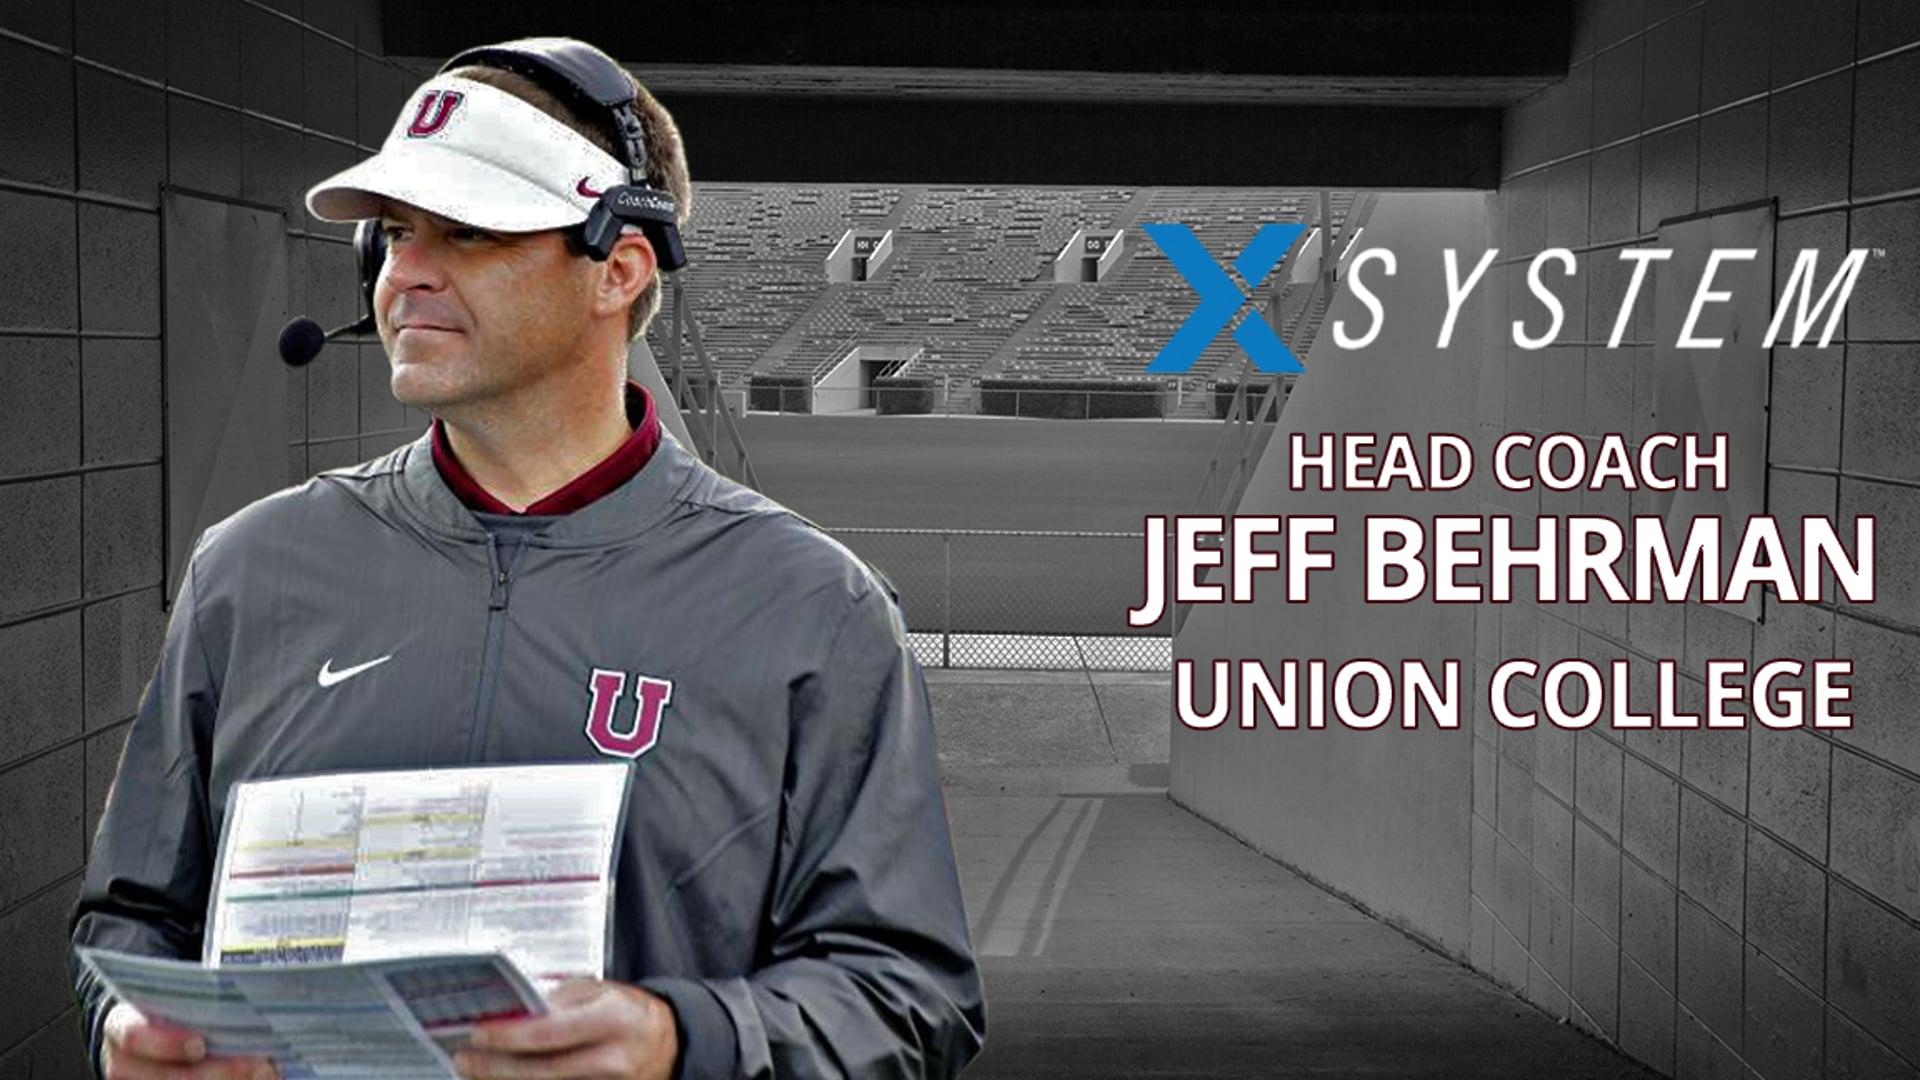 X-System: Jeff Behrman, Union College